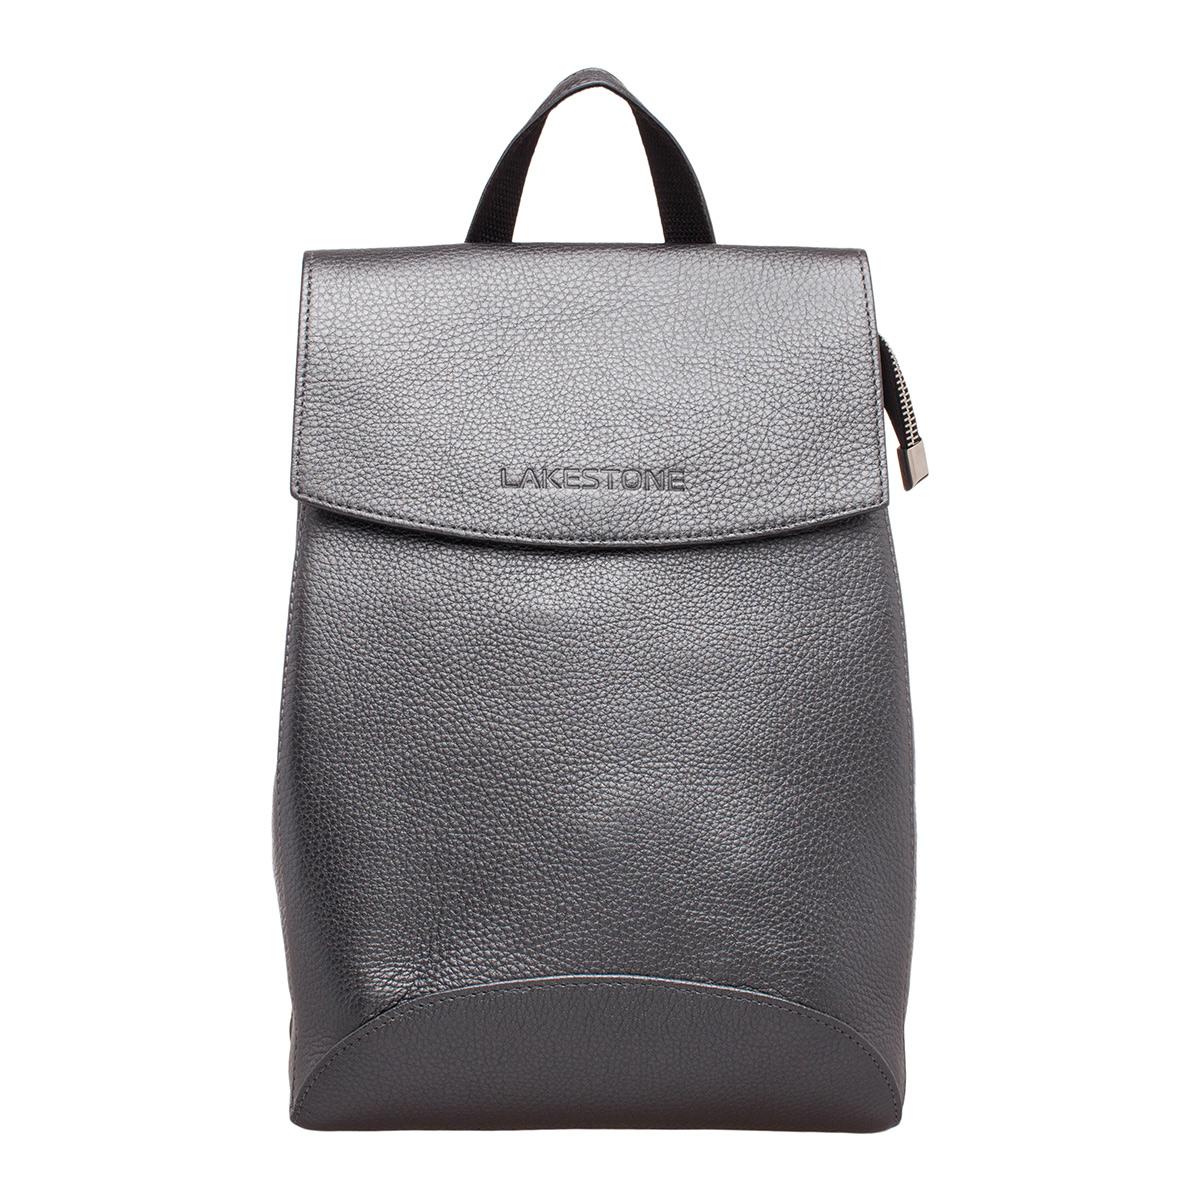 d08d798ae12b Женский кожаный рюкзак-трансформер Lakestone Ashley Silver Grey